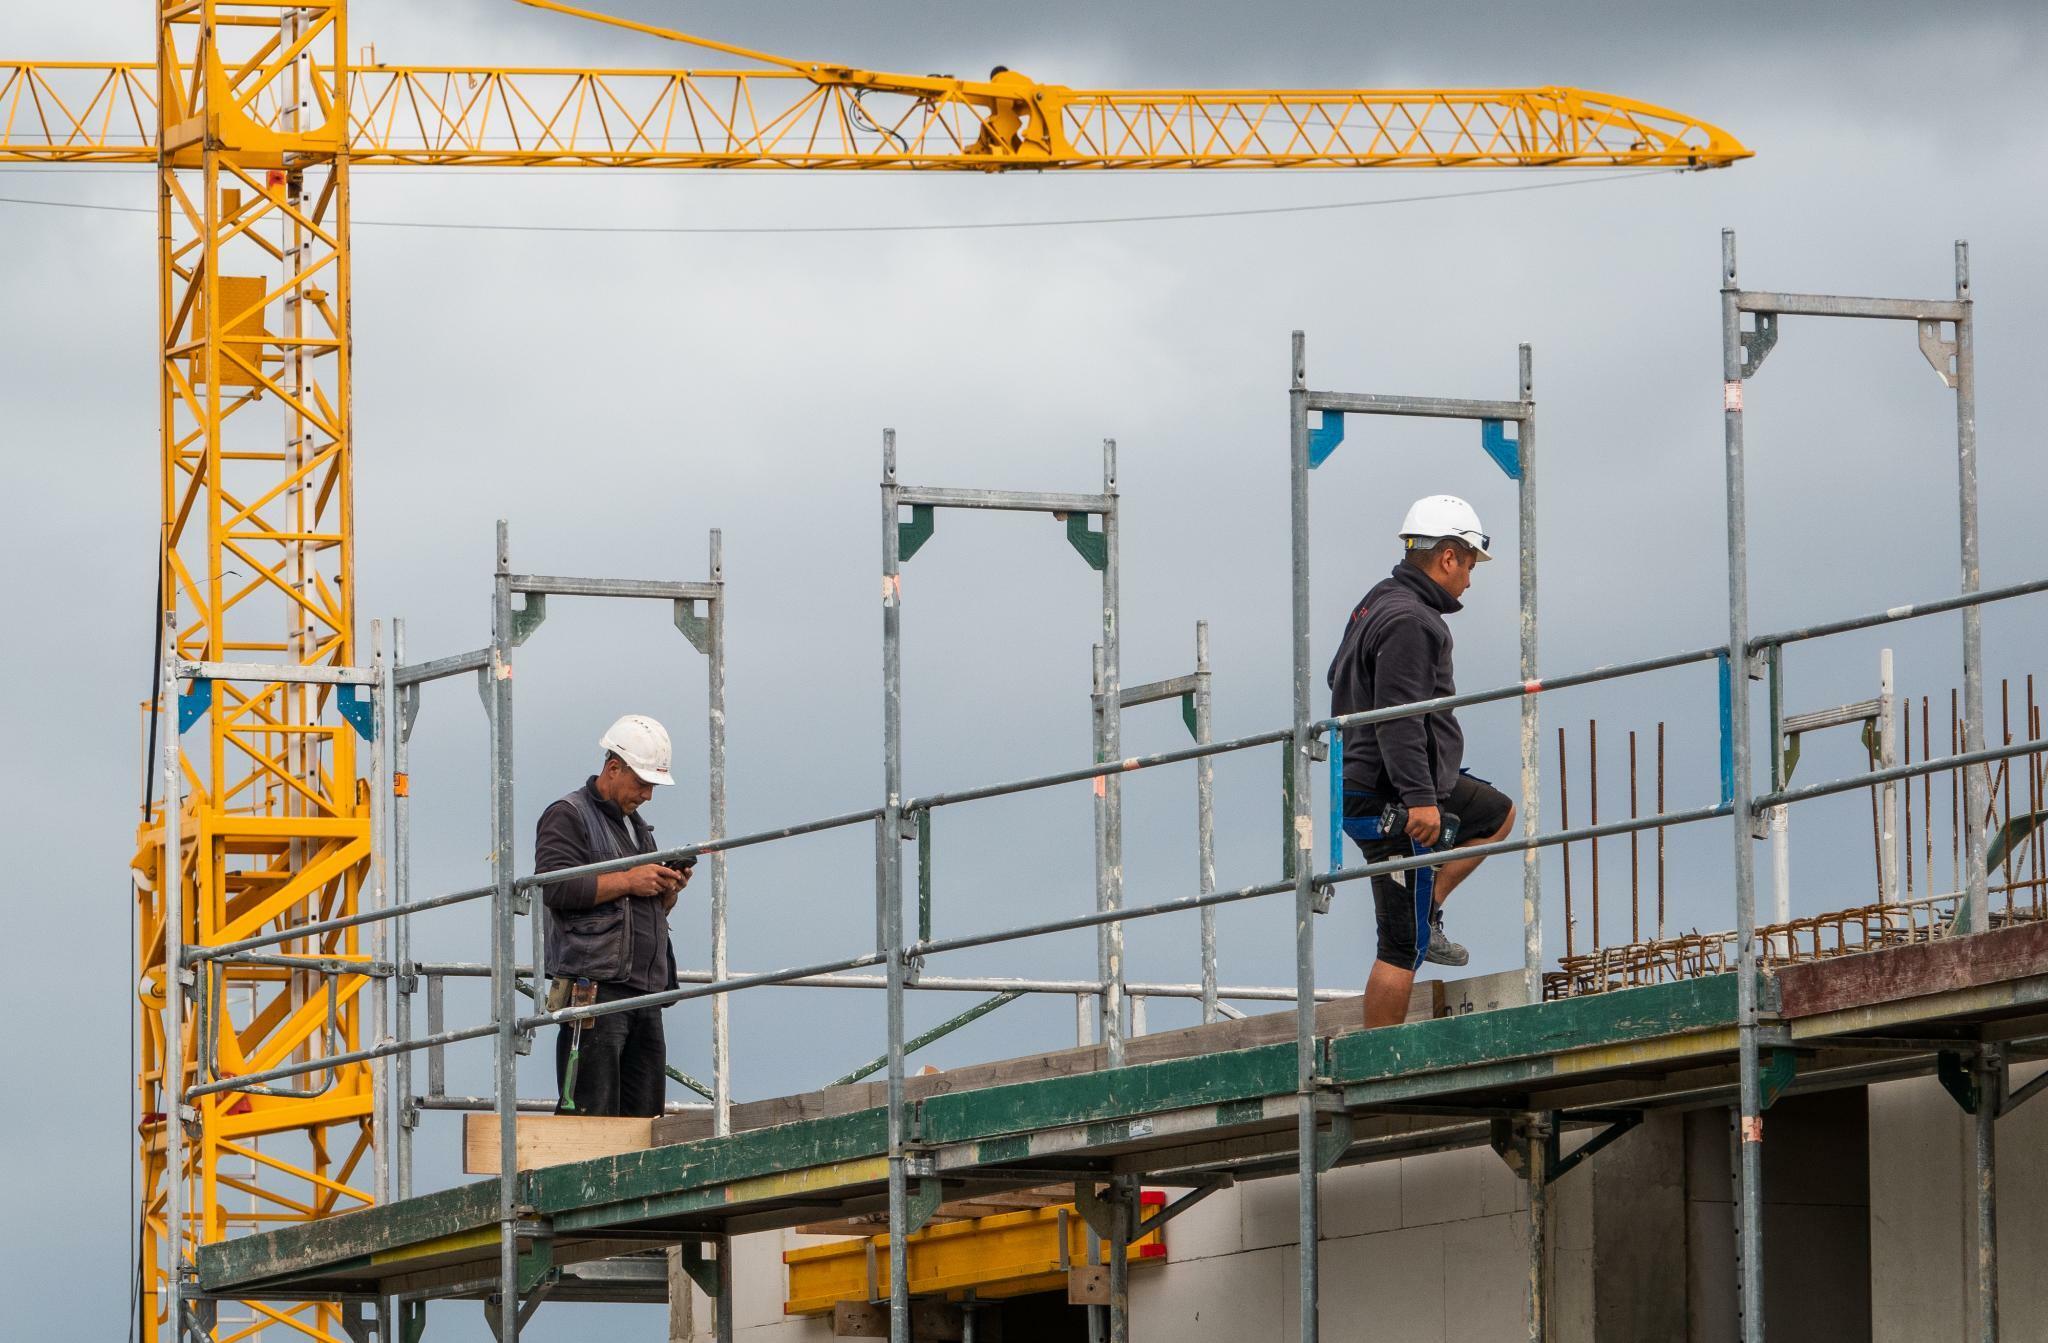 Baufinanzierung: Der Nullzins rückt immer näher